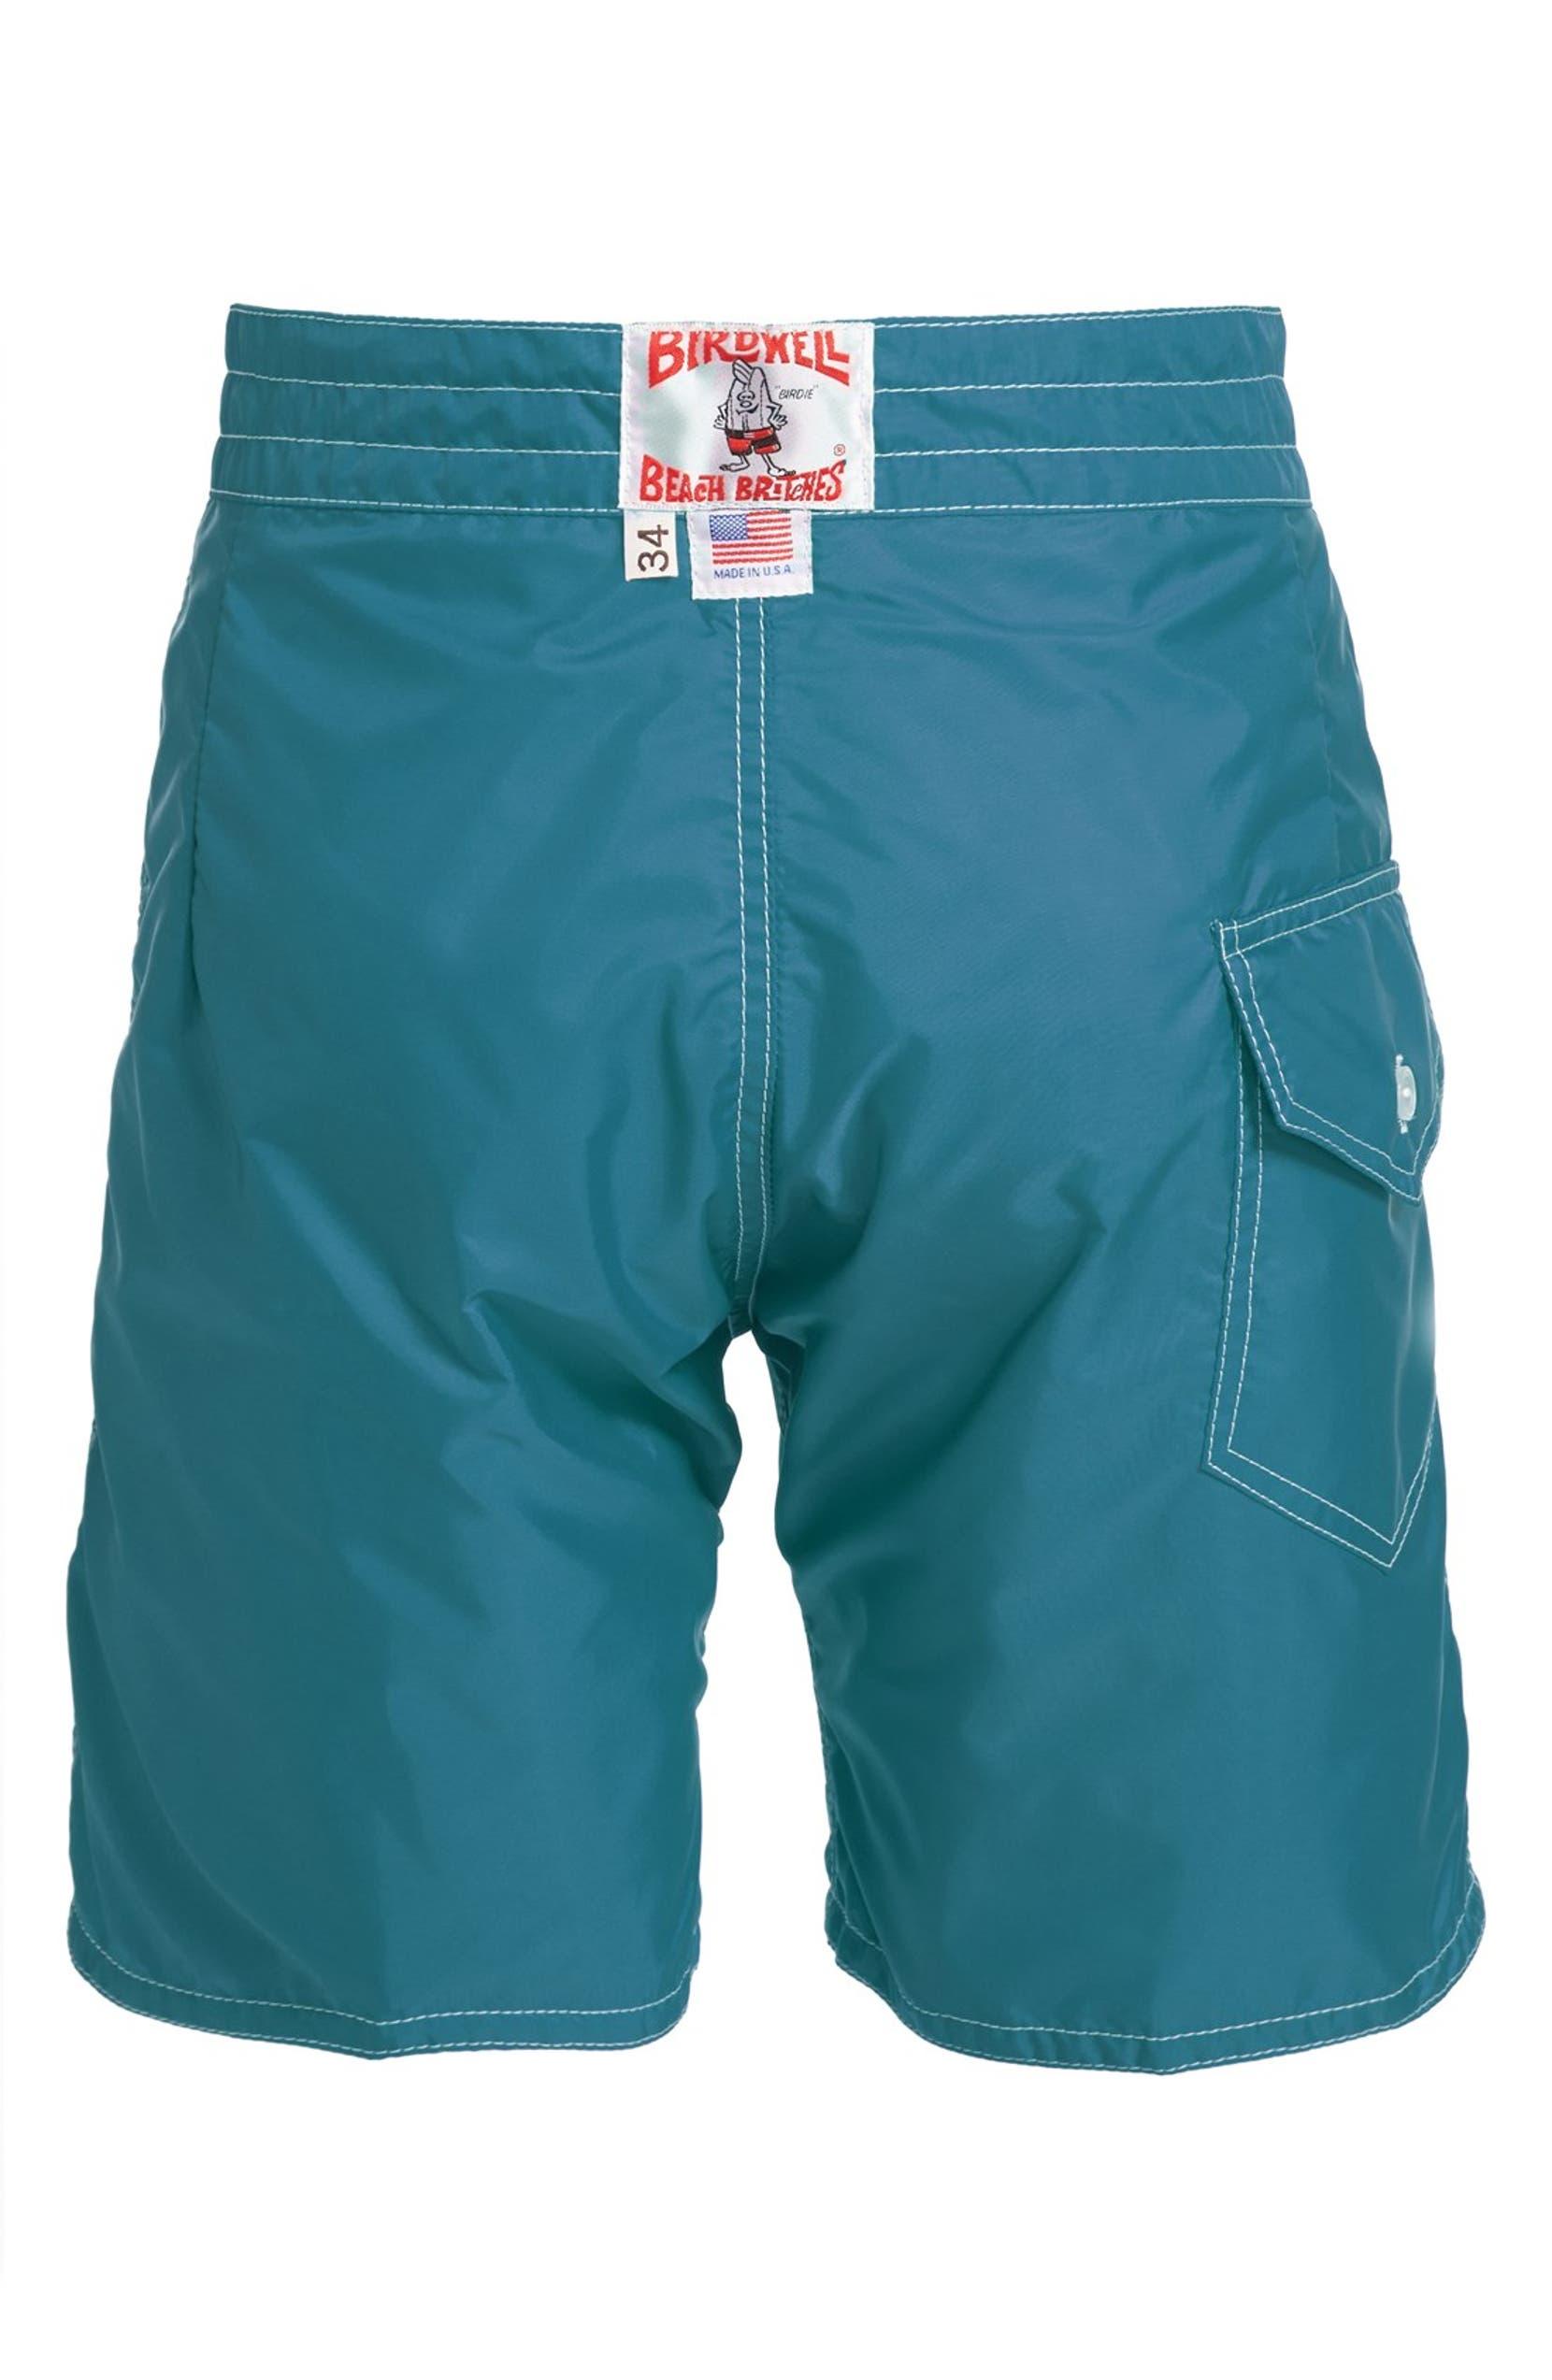 64bcd1312c Birdwell Beach Britches 'Classic 303' Board Shorts | Nordstrom